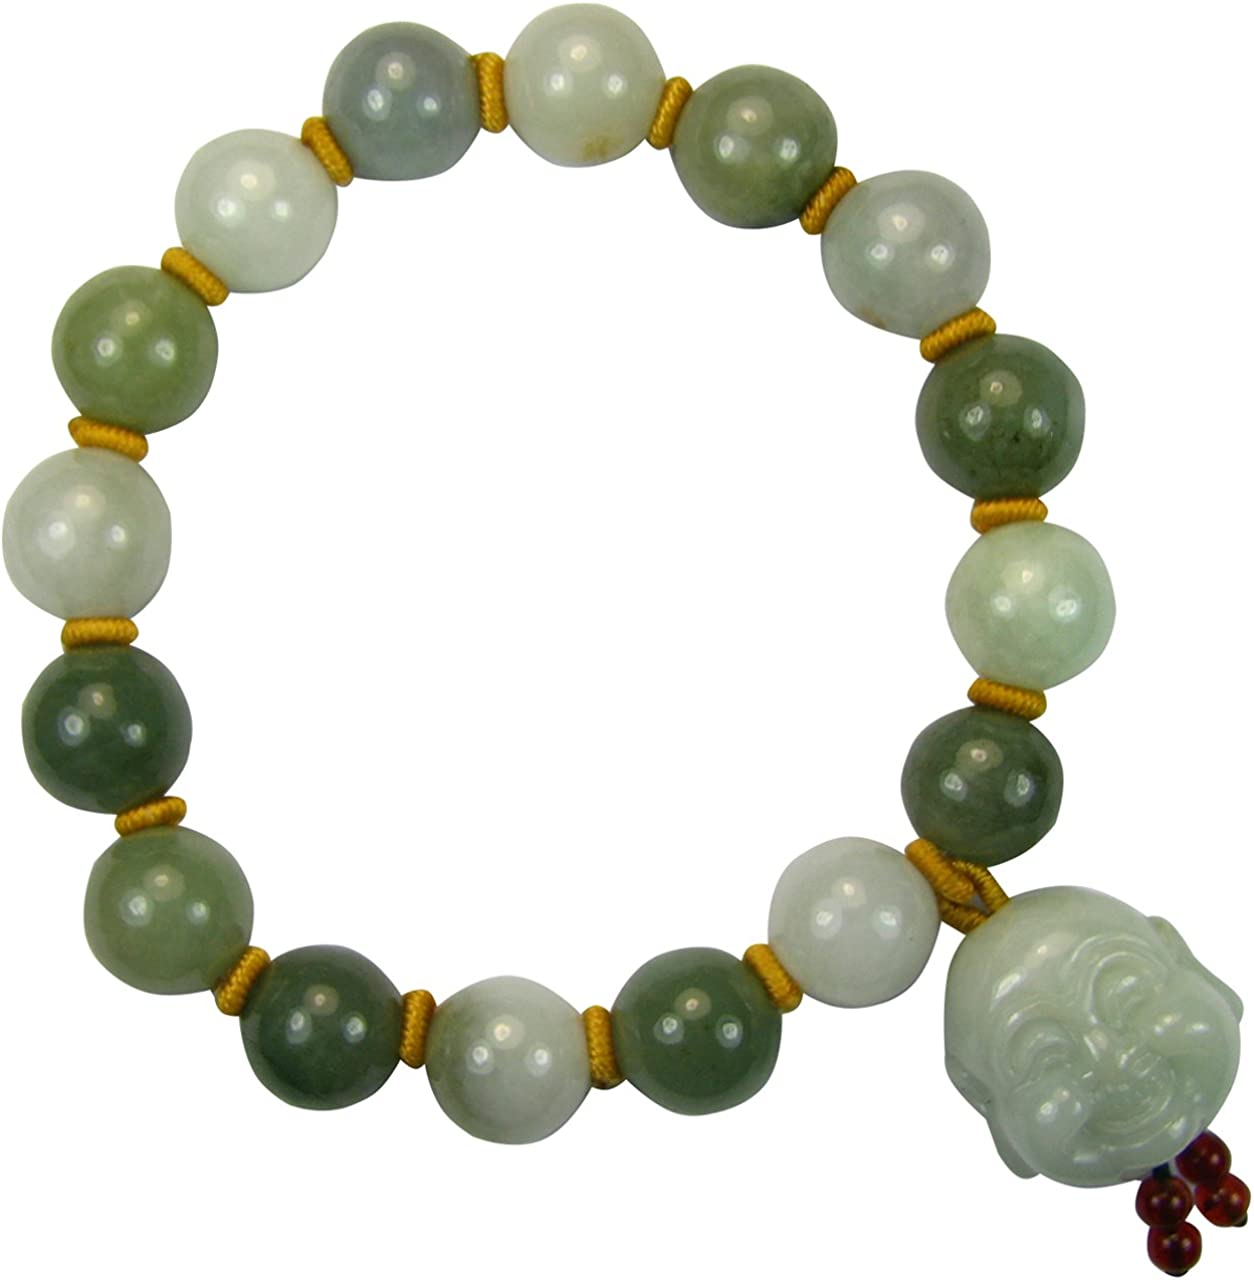 Dahlia Laughing Buddha Jade Bead Bracelet Genuine Certified Grade A Jadeite